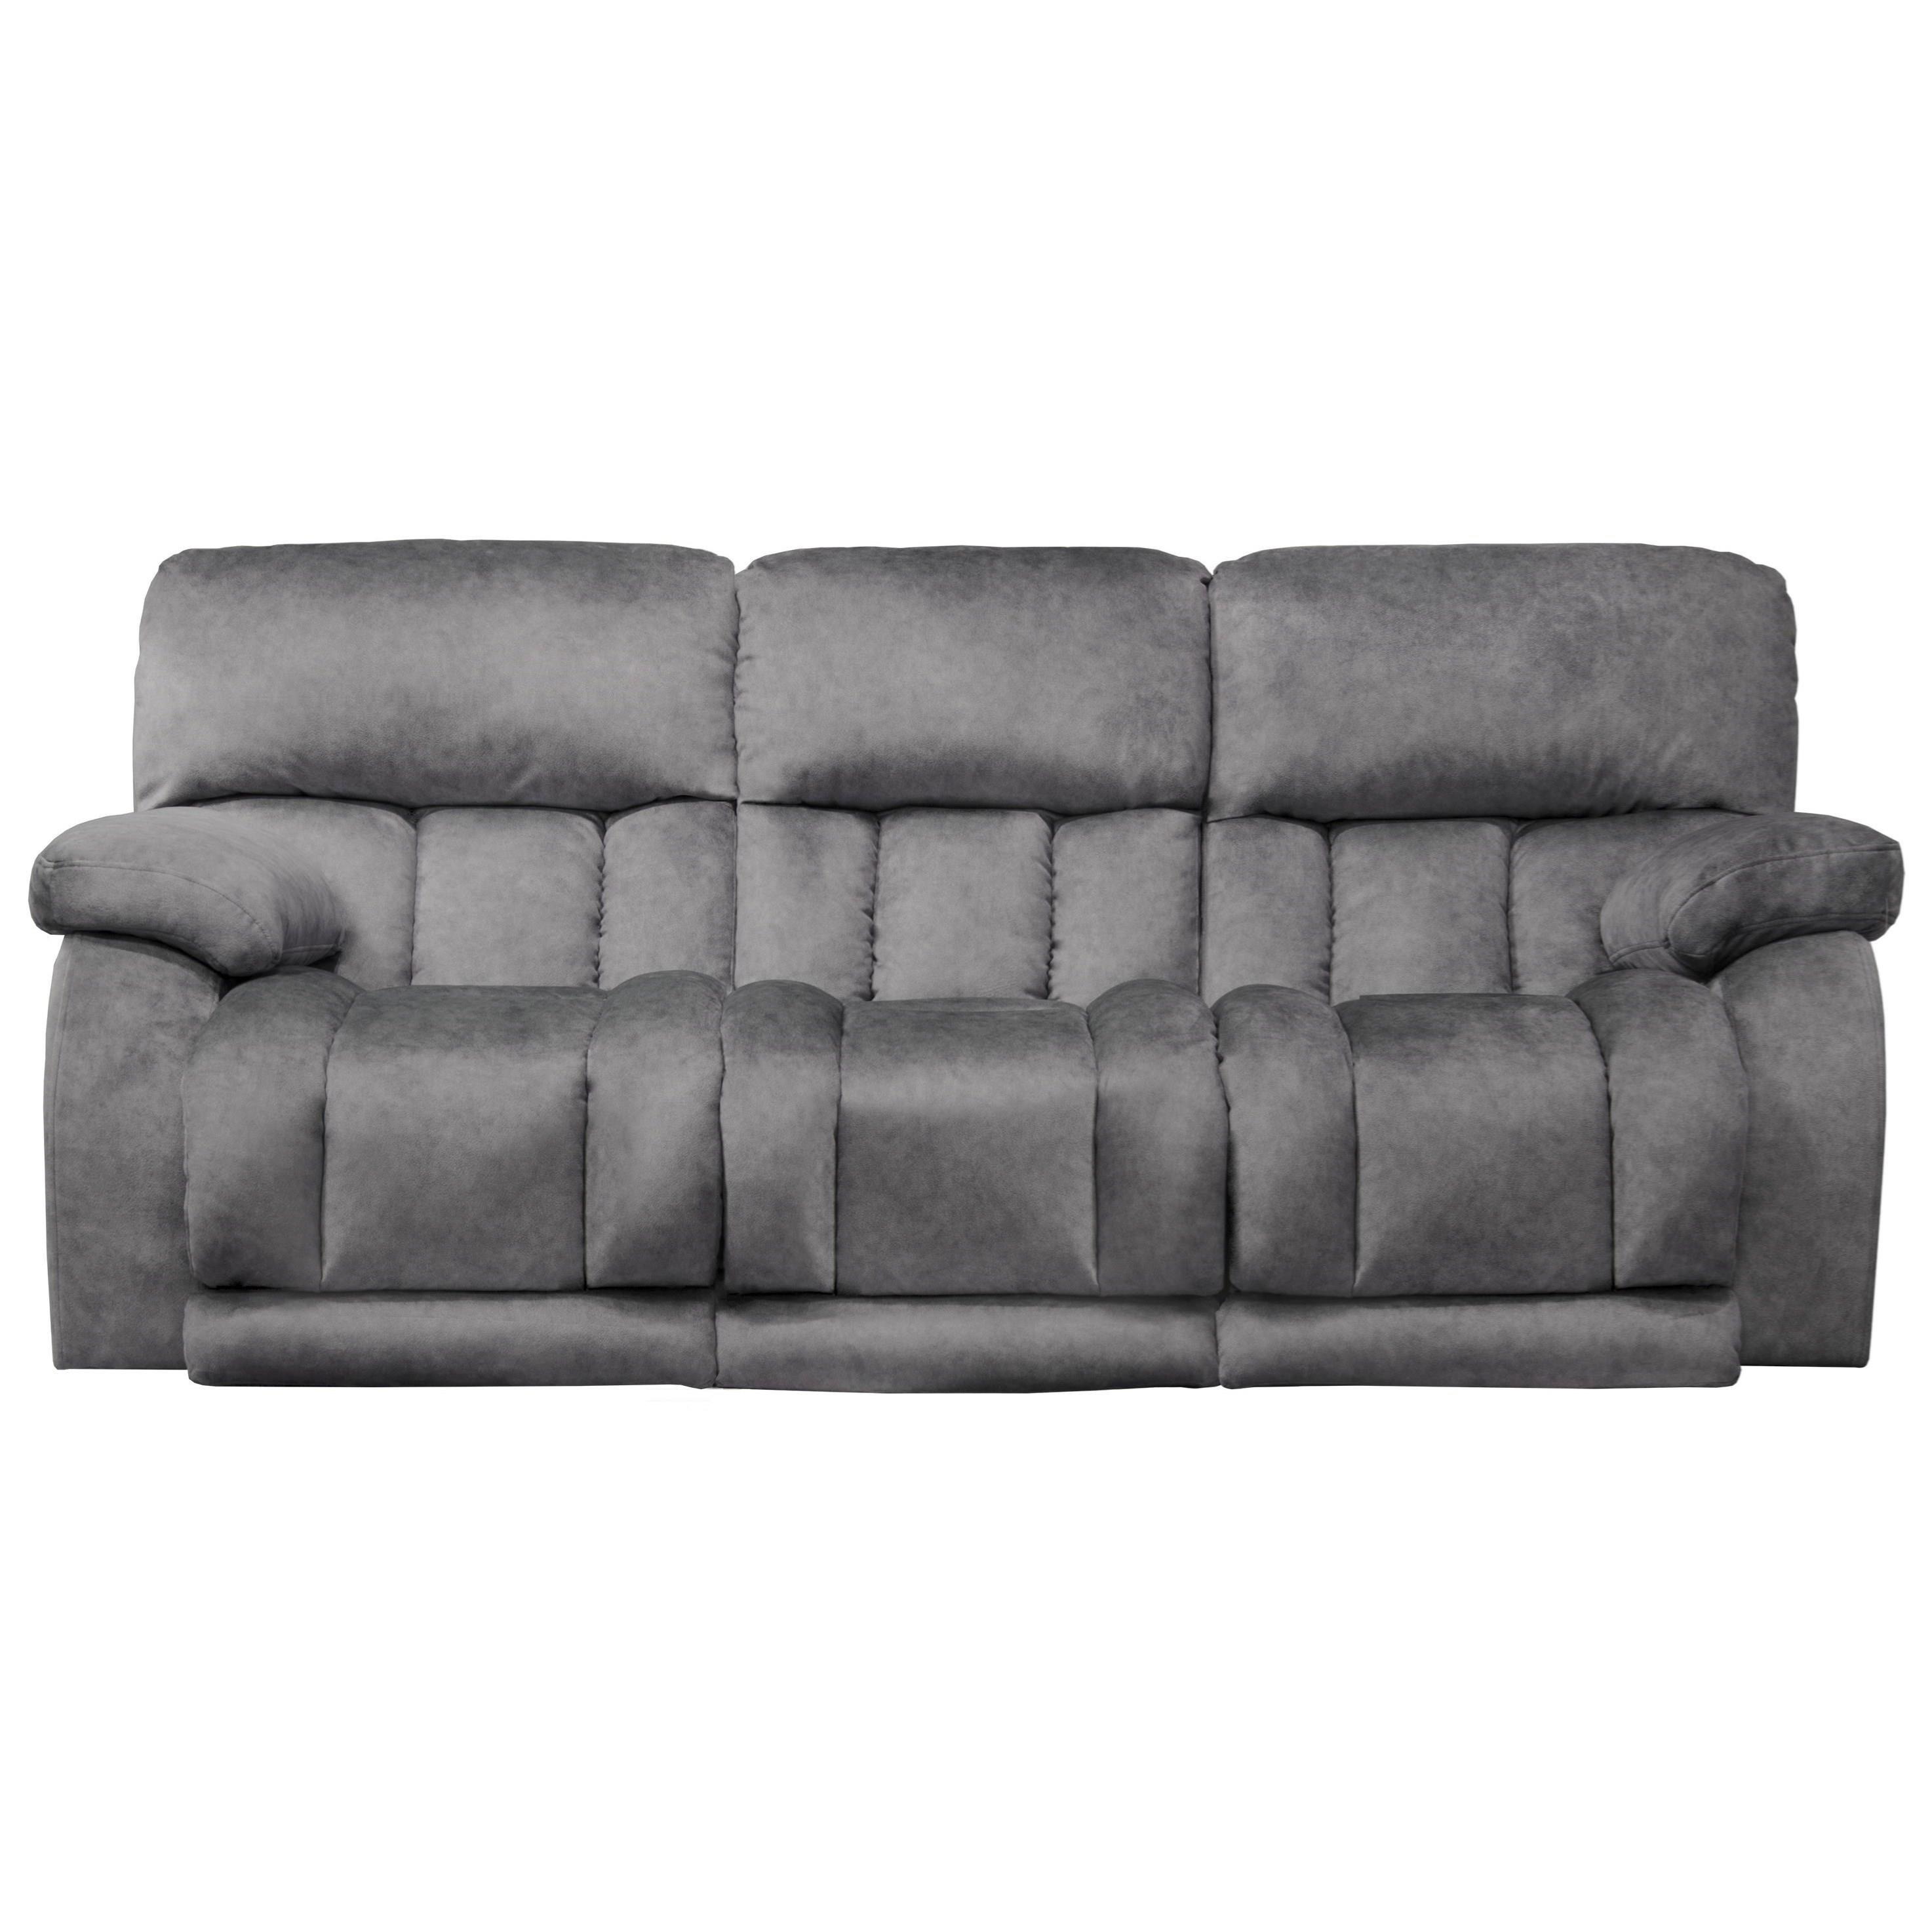 Catnapper KendallPower Lay Flat Reclining Sofa ...